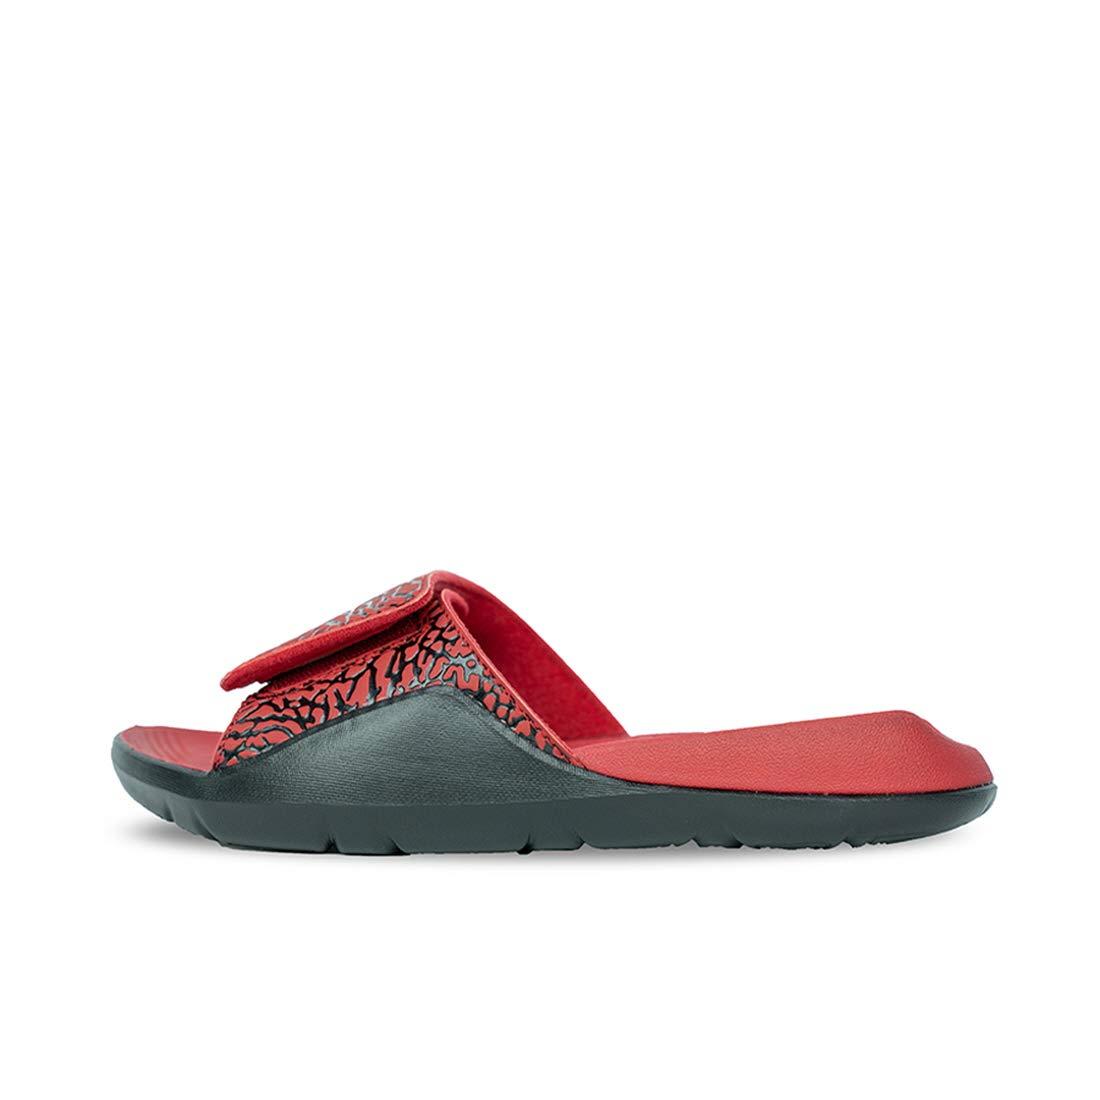 98e36f90b6d Amazon.com: Jordan Hydro 7 V2 Black/Black-Gym Red, 12 D(M) US: Clothing